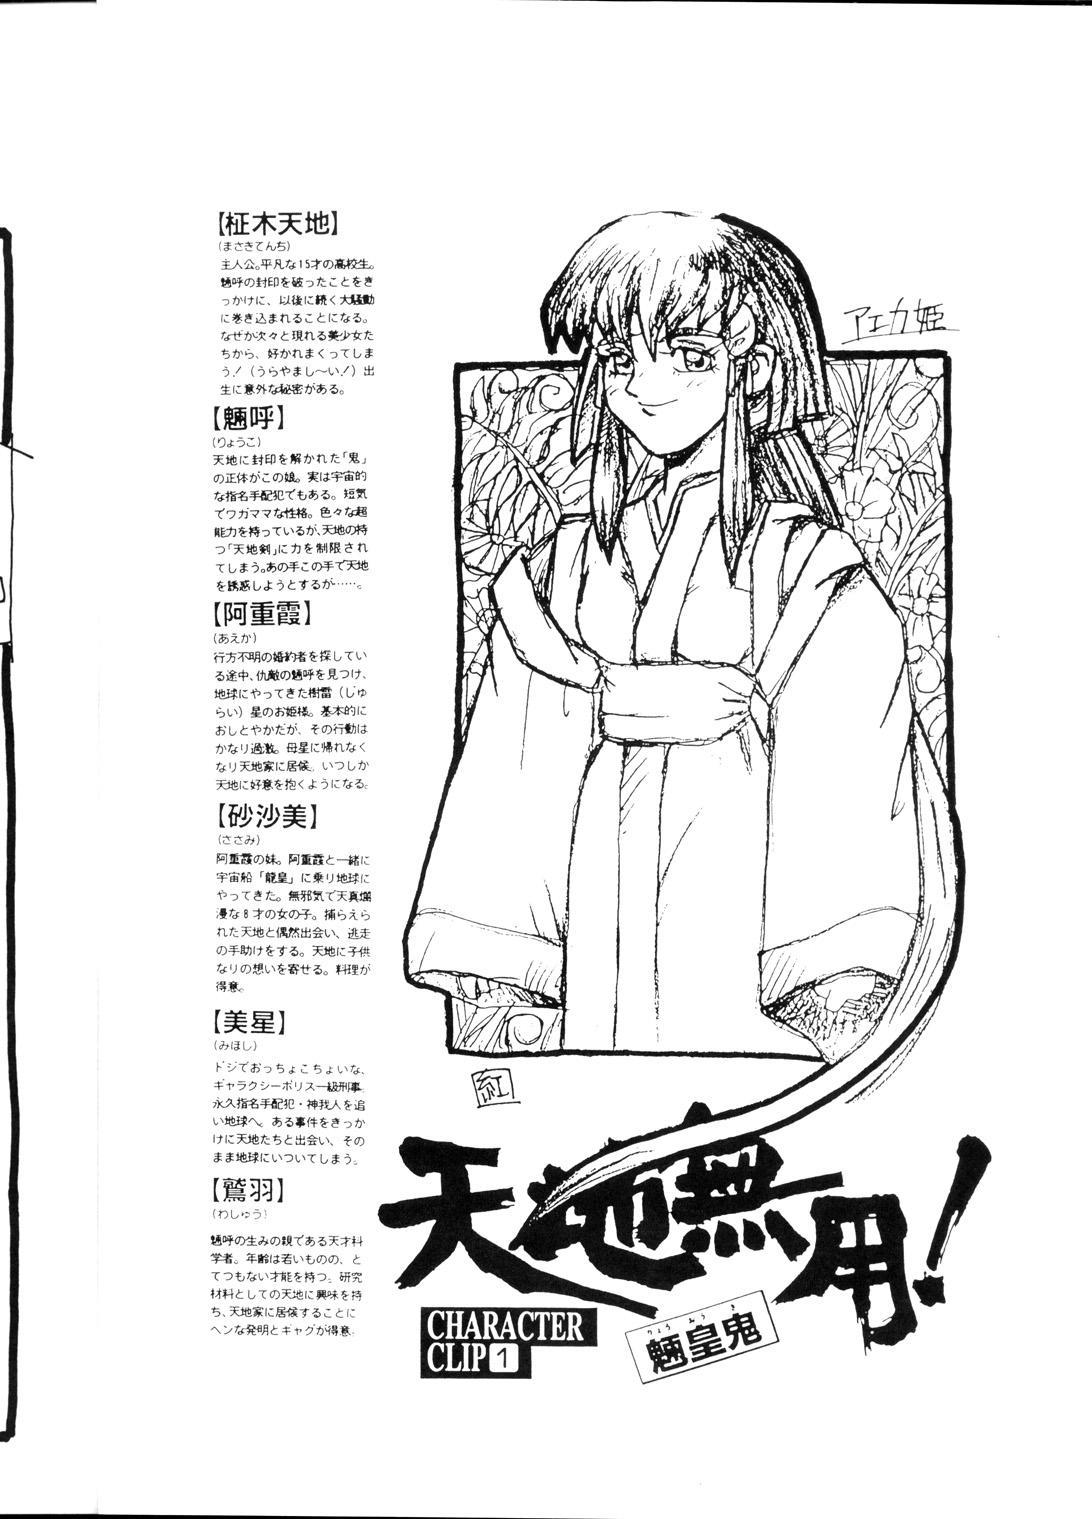 [B.B.C] Tenchi Muyou! Ryou-ou-ki Kaiteiben (Tenchi Muyou!) 4